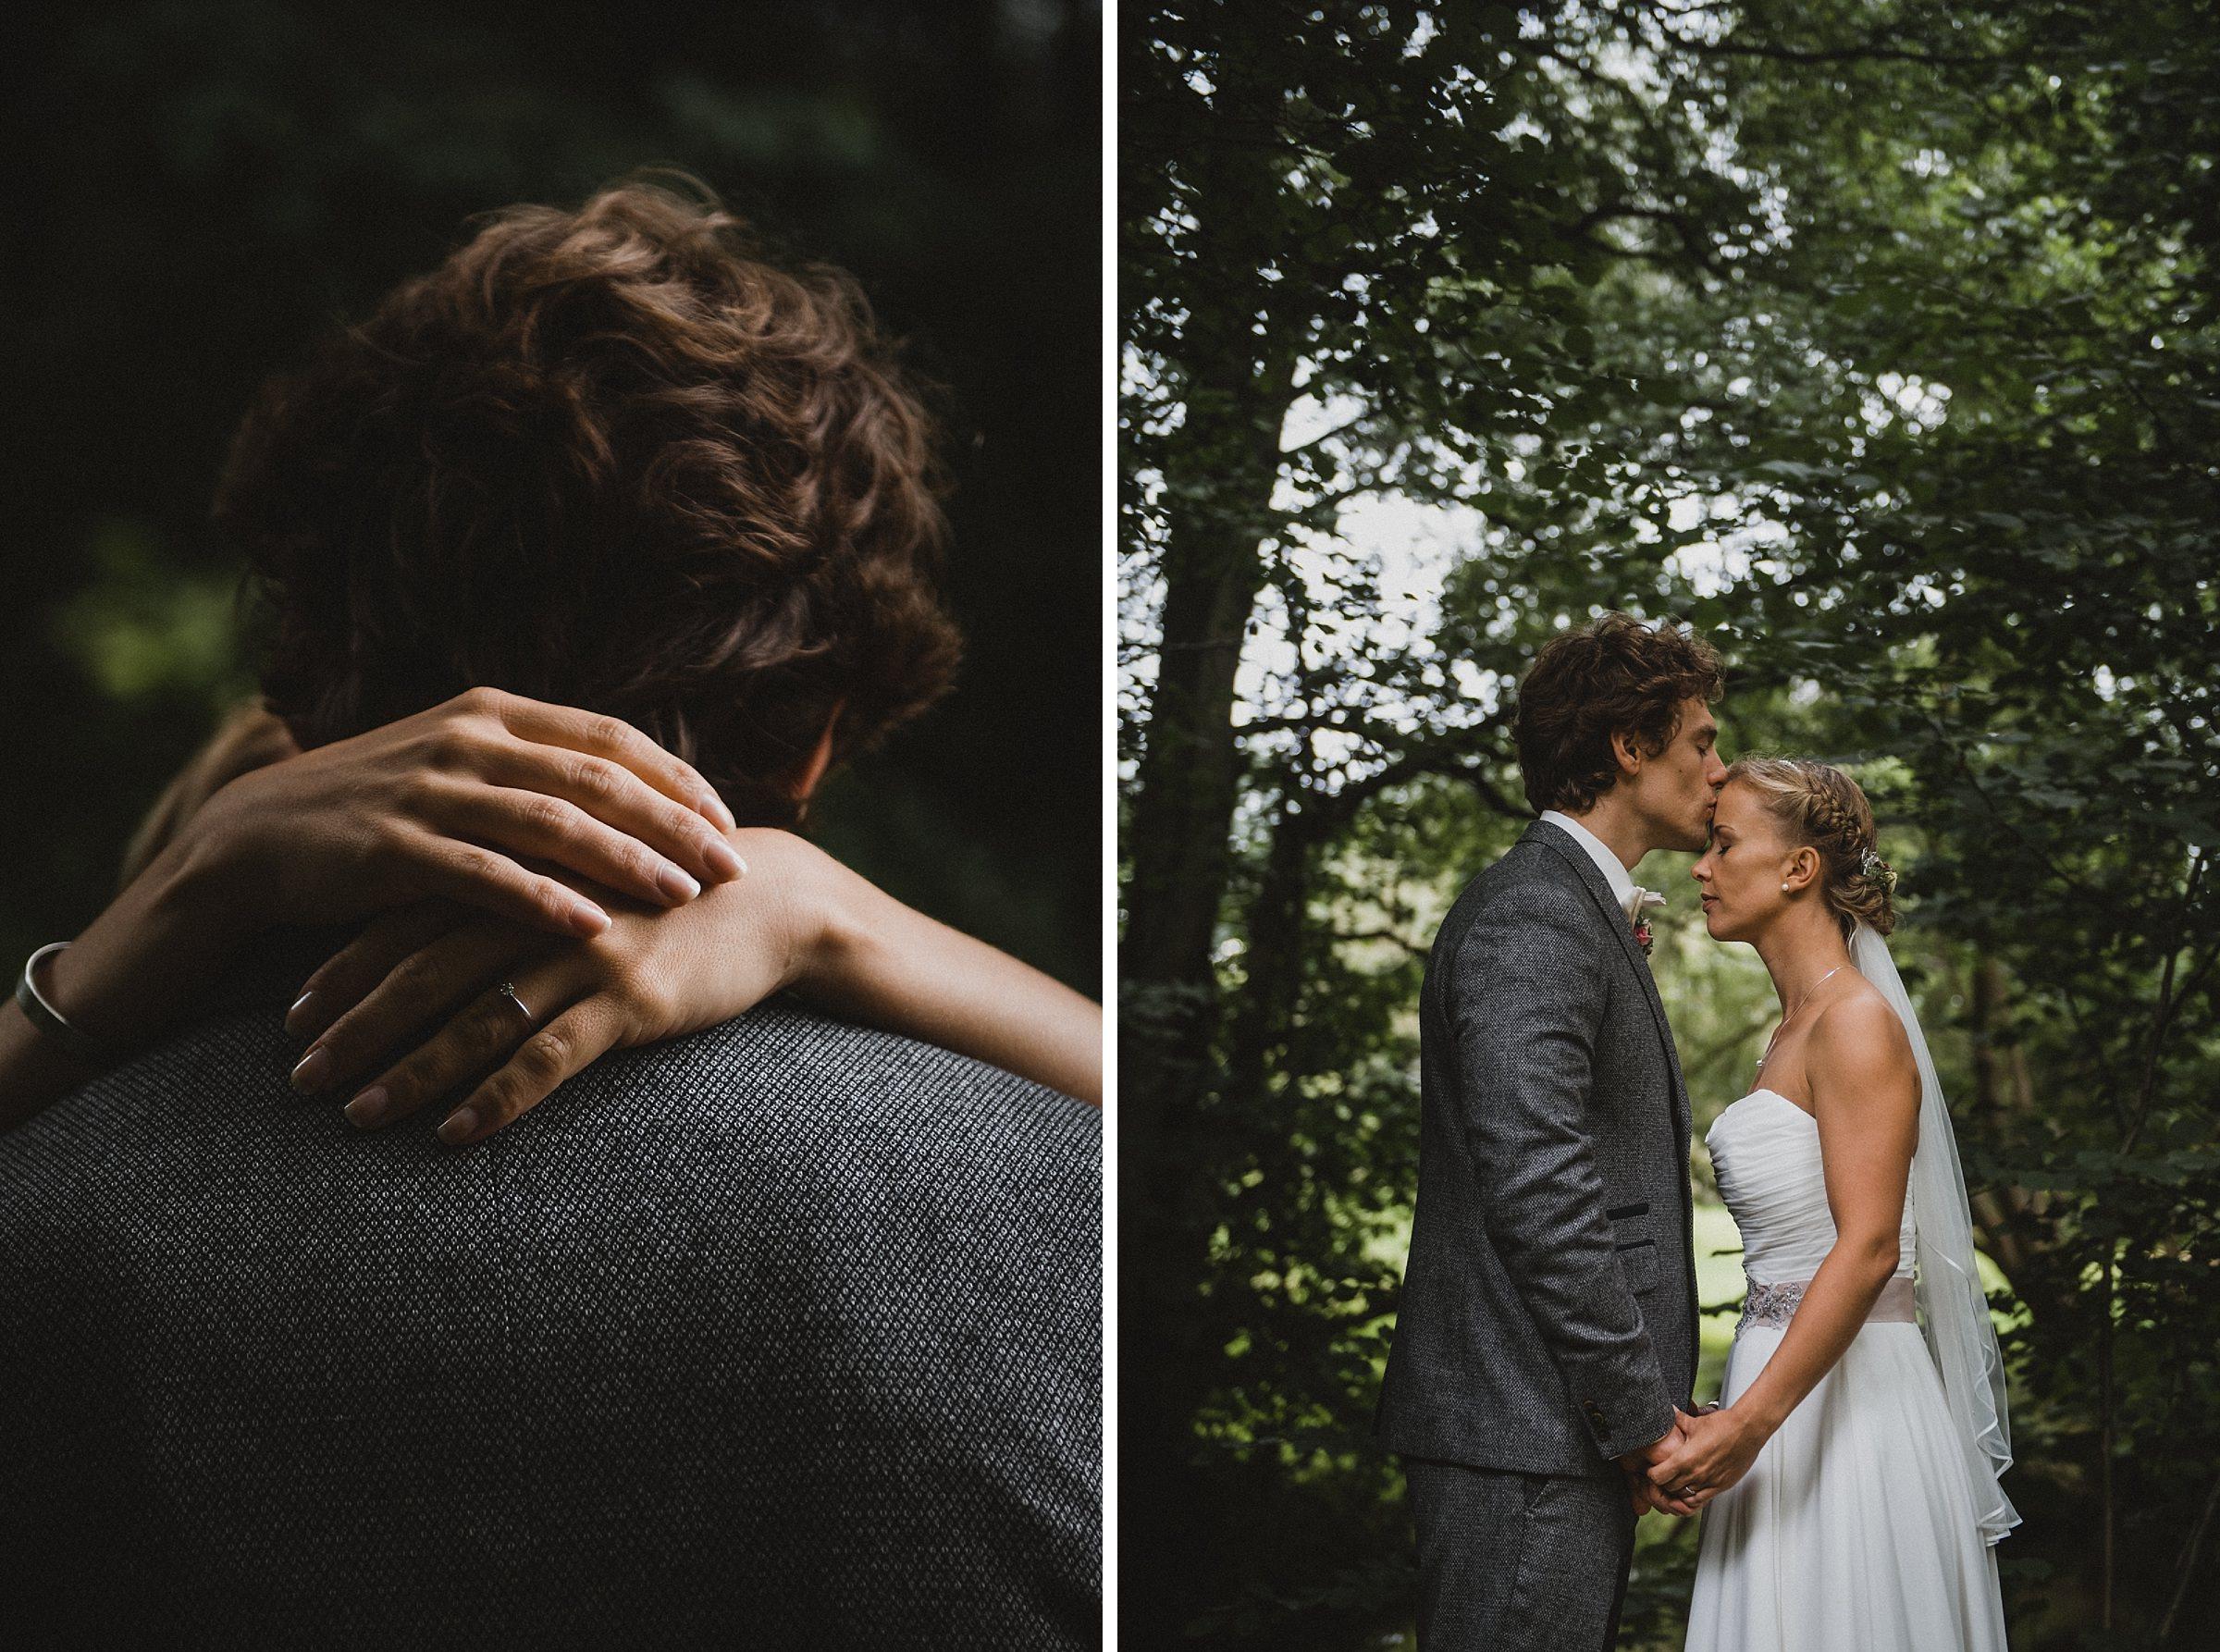 Hochzeitsfotografie-Frau-Siemers-Hof Weihe-Portrait